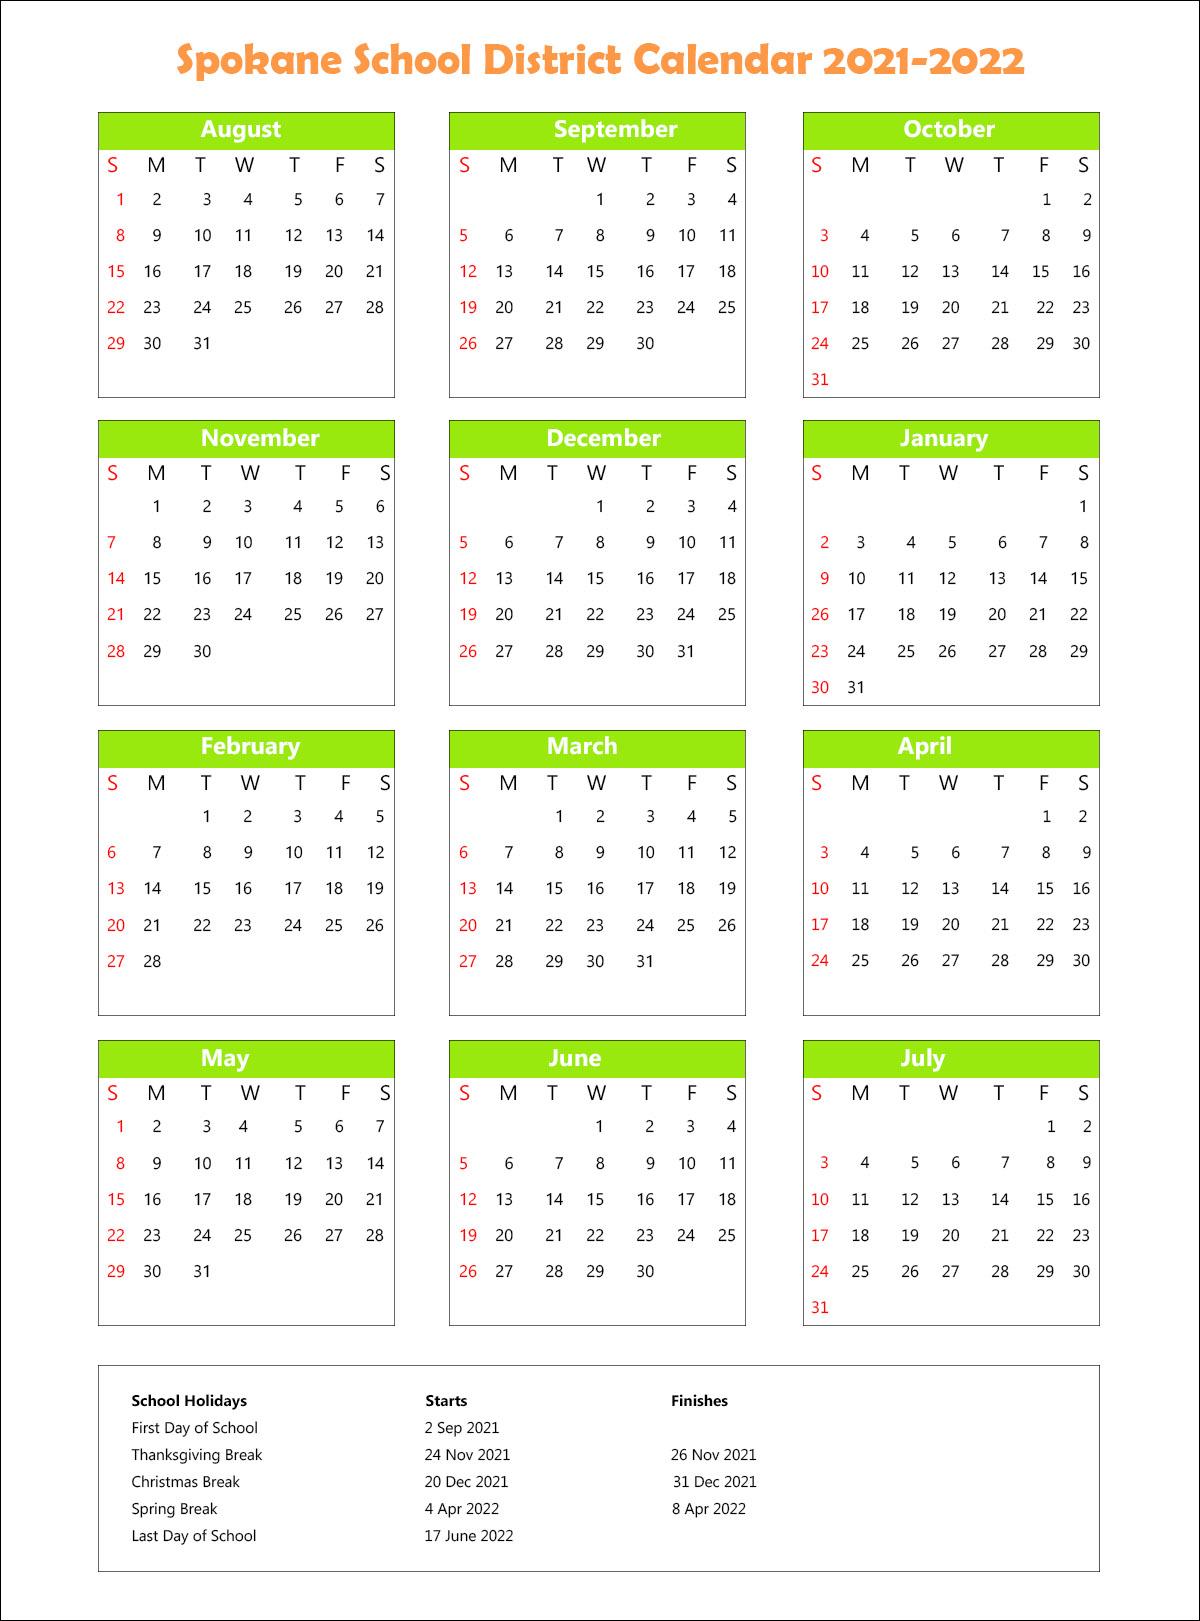 Spokane School District, Washington Calendar Holidays 2021